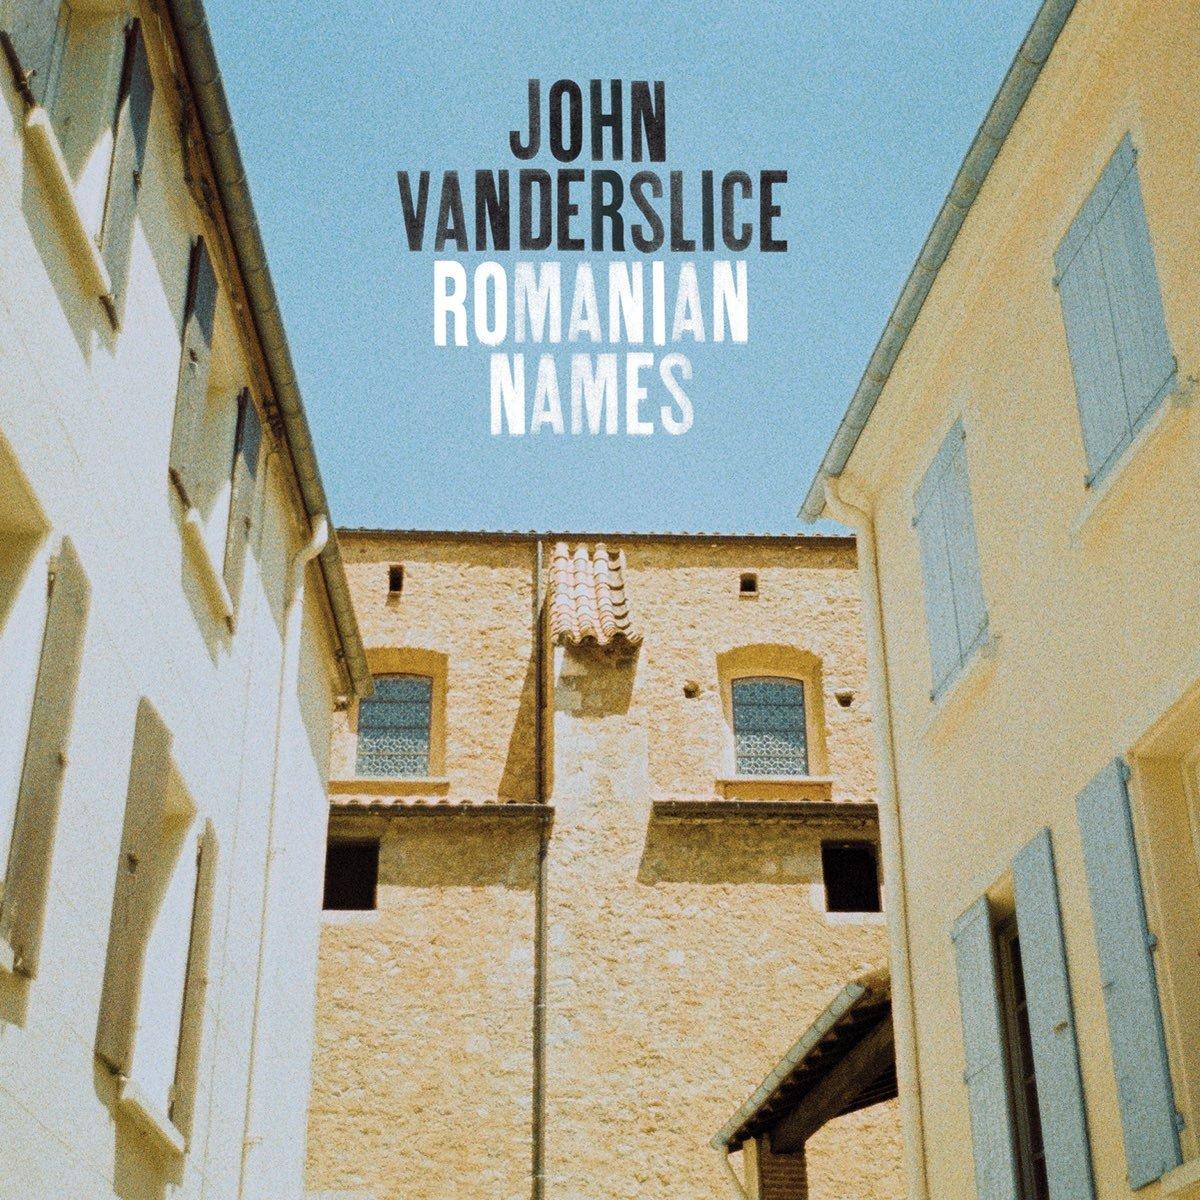 John Vanderslice, Romanian Names